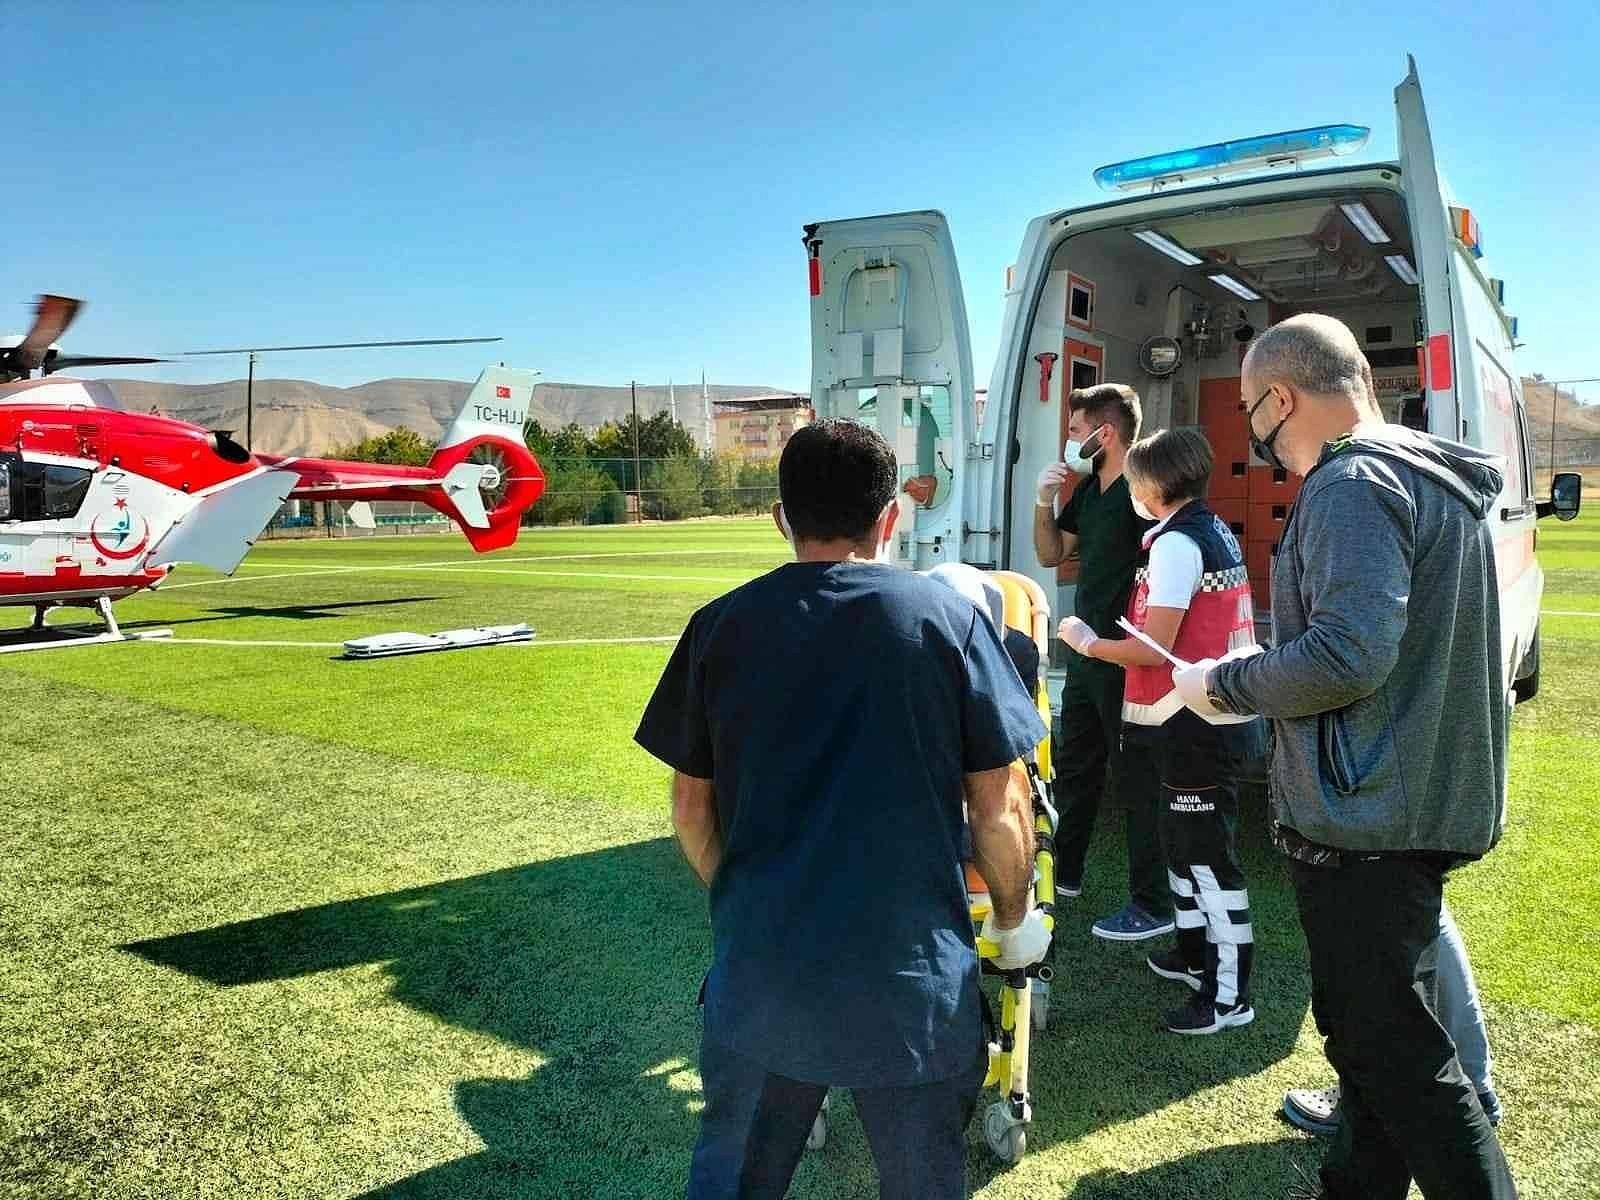 2021/10/ambulans-helikopter-kalp-krizi-geciren-hasta-icin-havalandi-20211012AW43-1.jpg